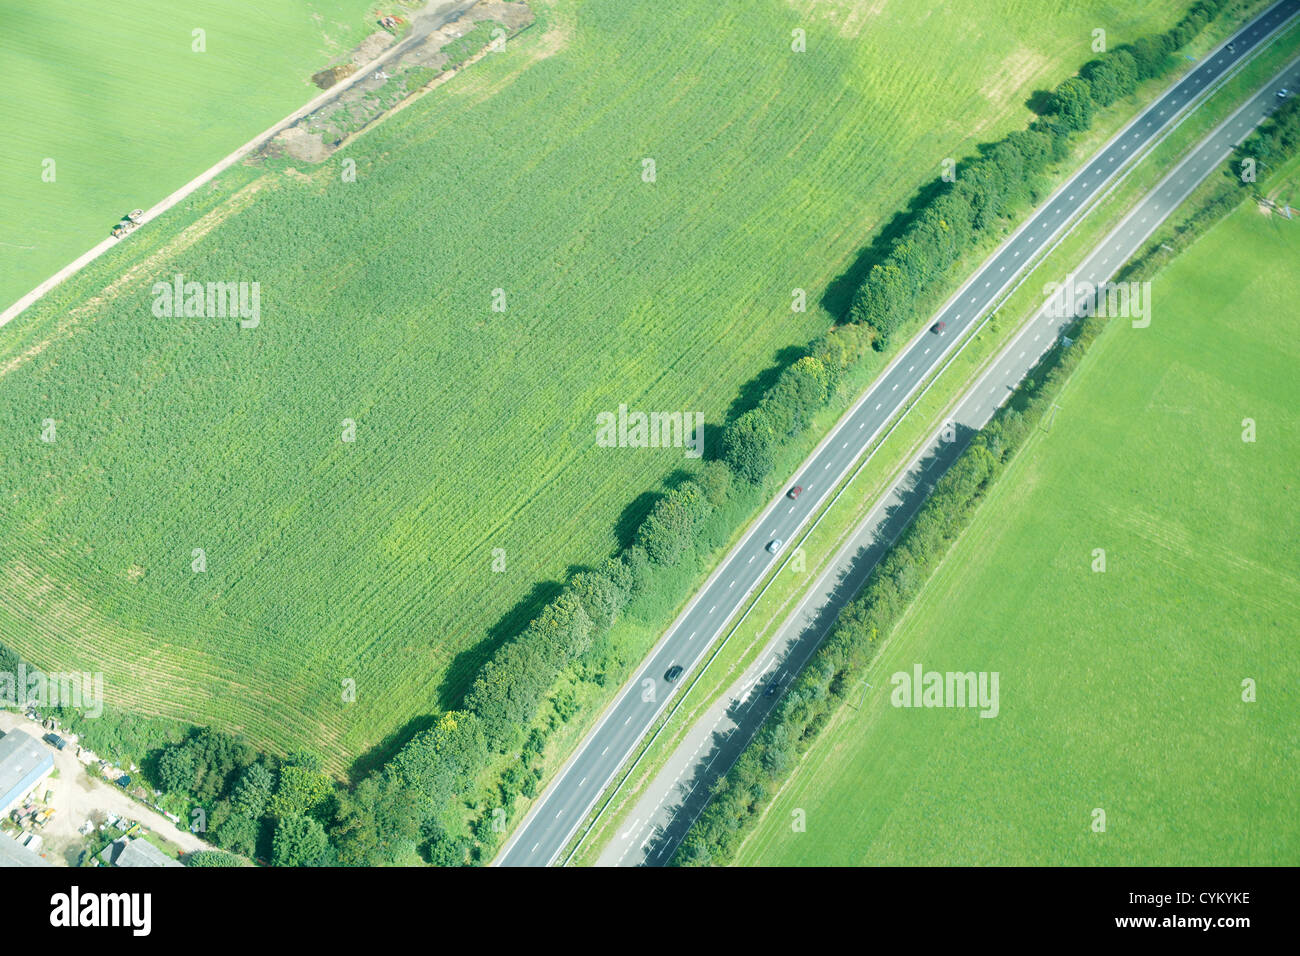 Aerial view of rural road - Stock Image